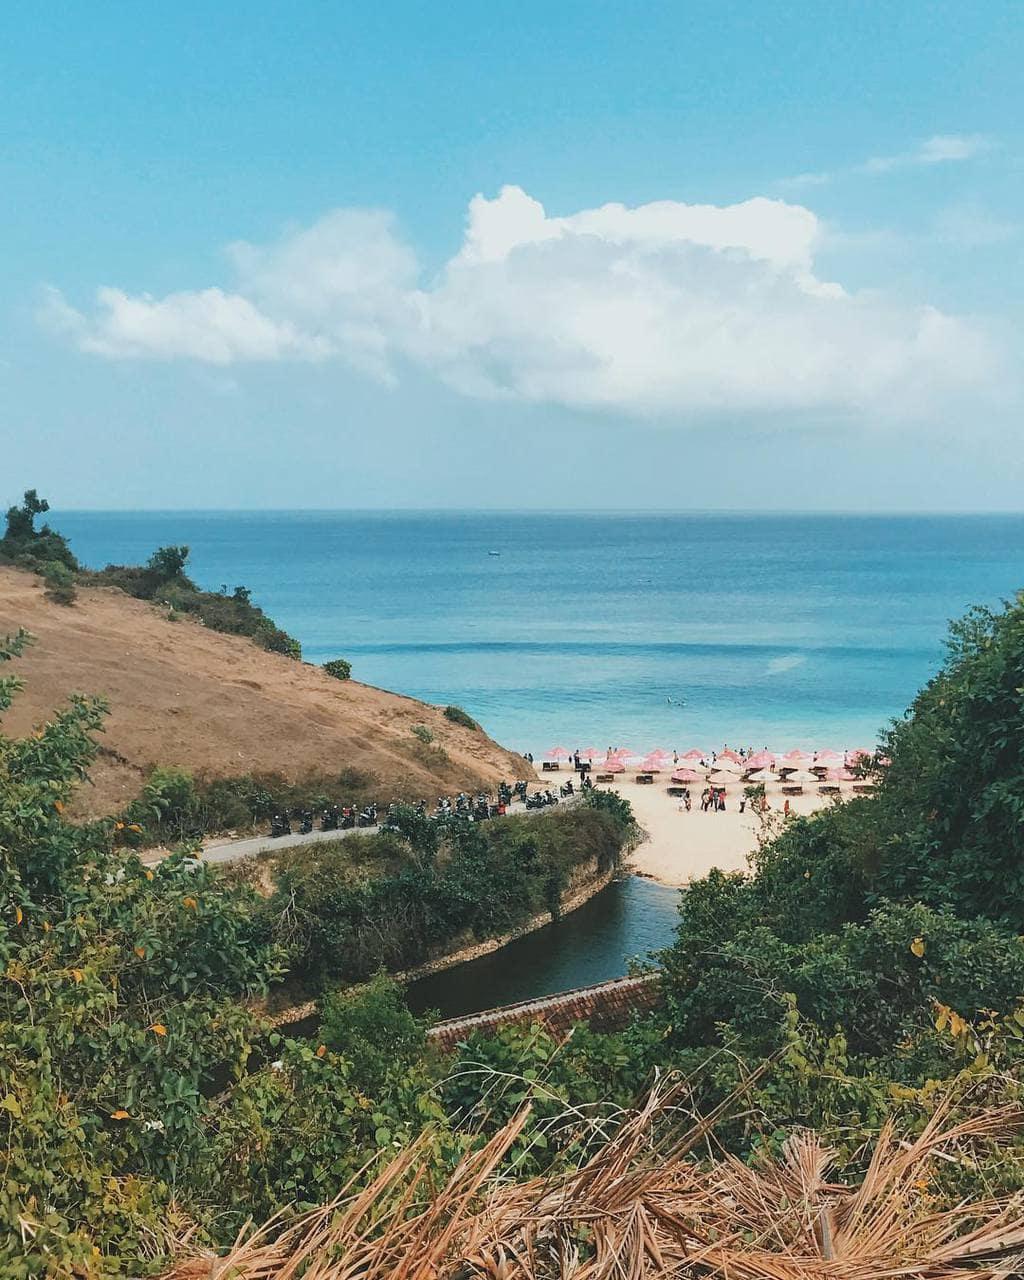 Pantai Dreamland, (Sumber: @mod.tography) Pantai Dreamland